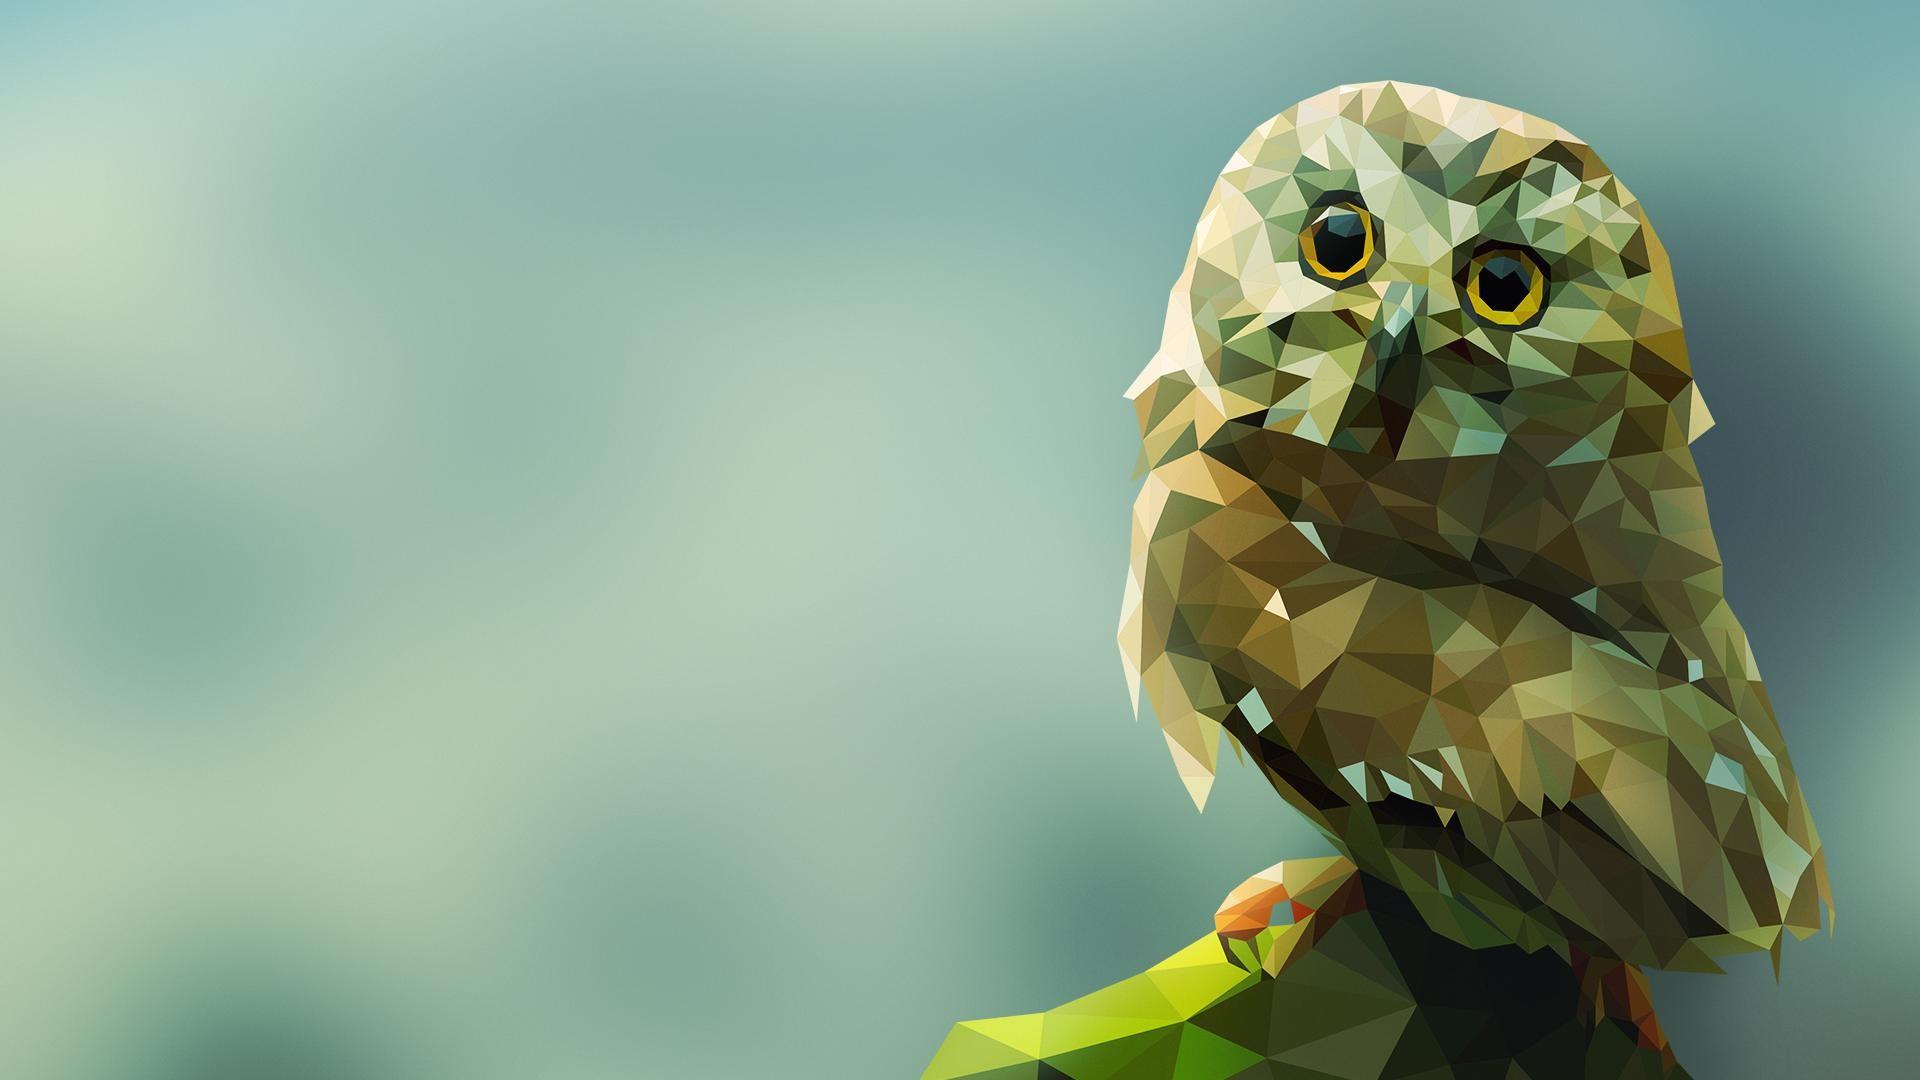 Polygonal Owl Wallpaper